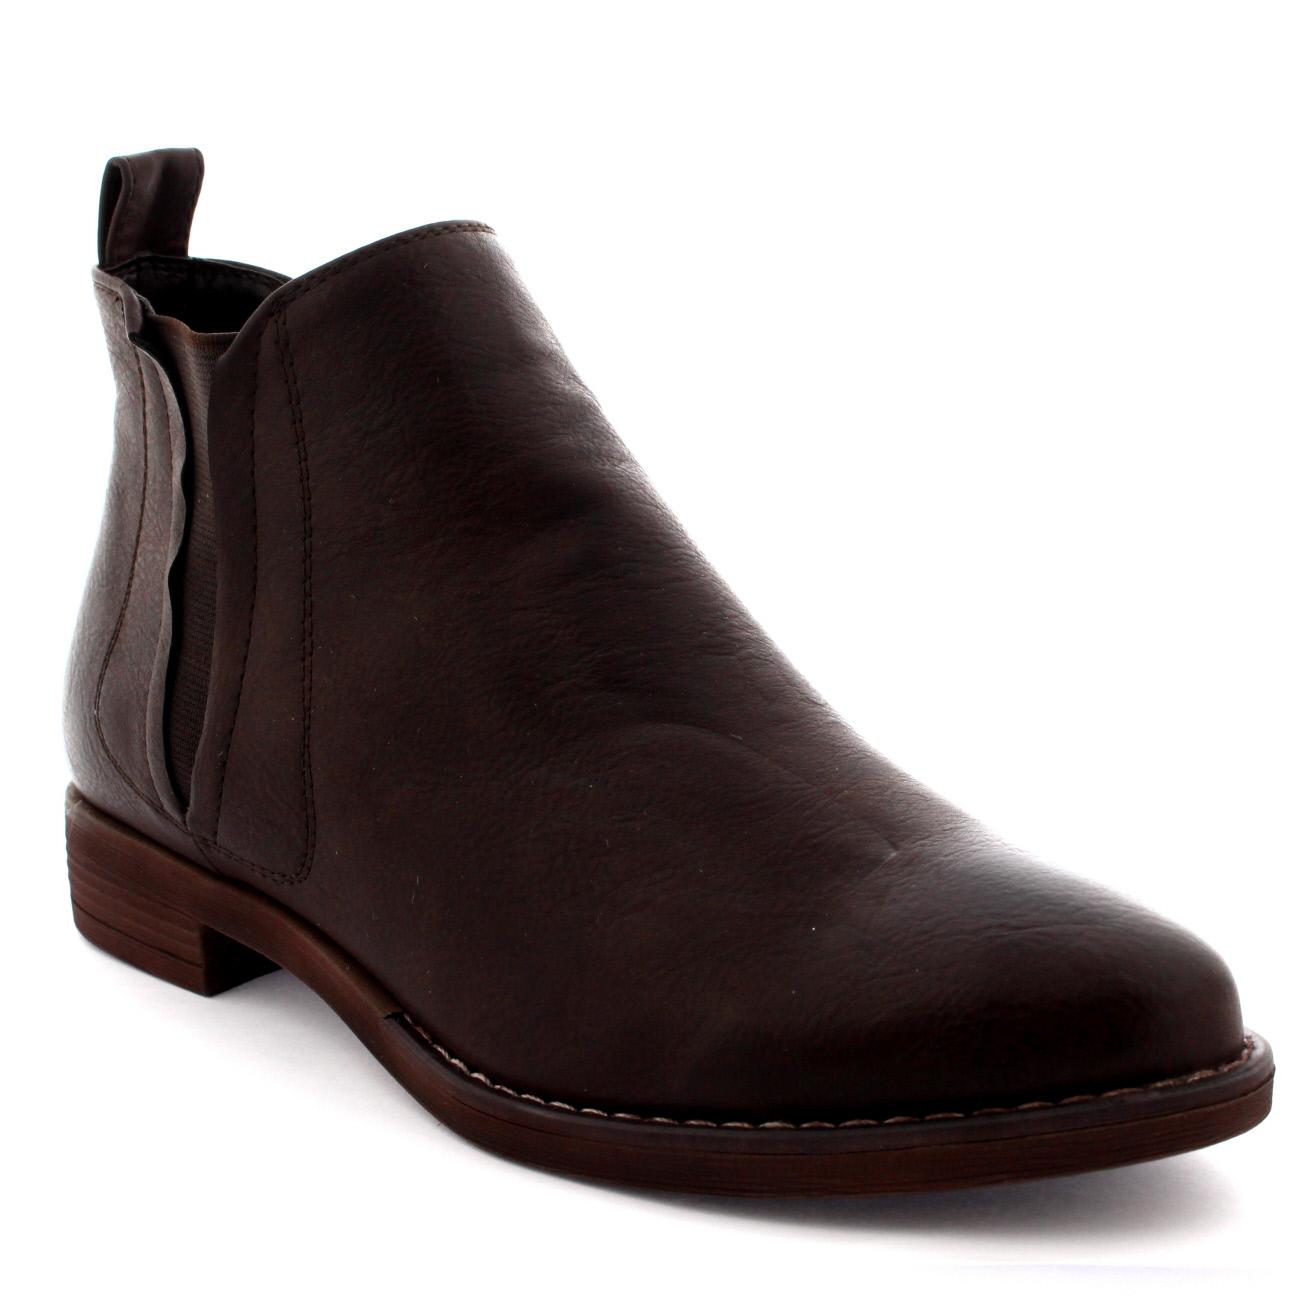 Consealed V Shape Chelsea Boots